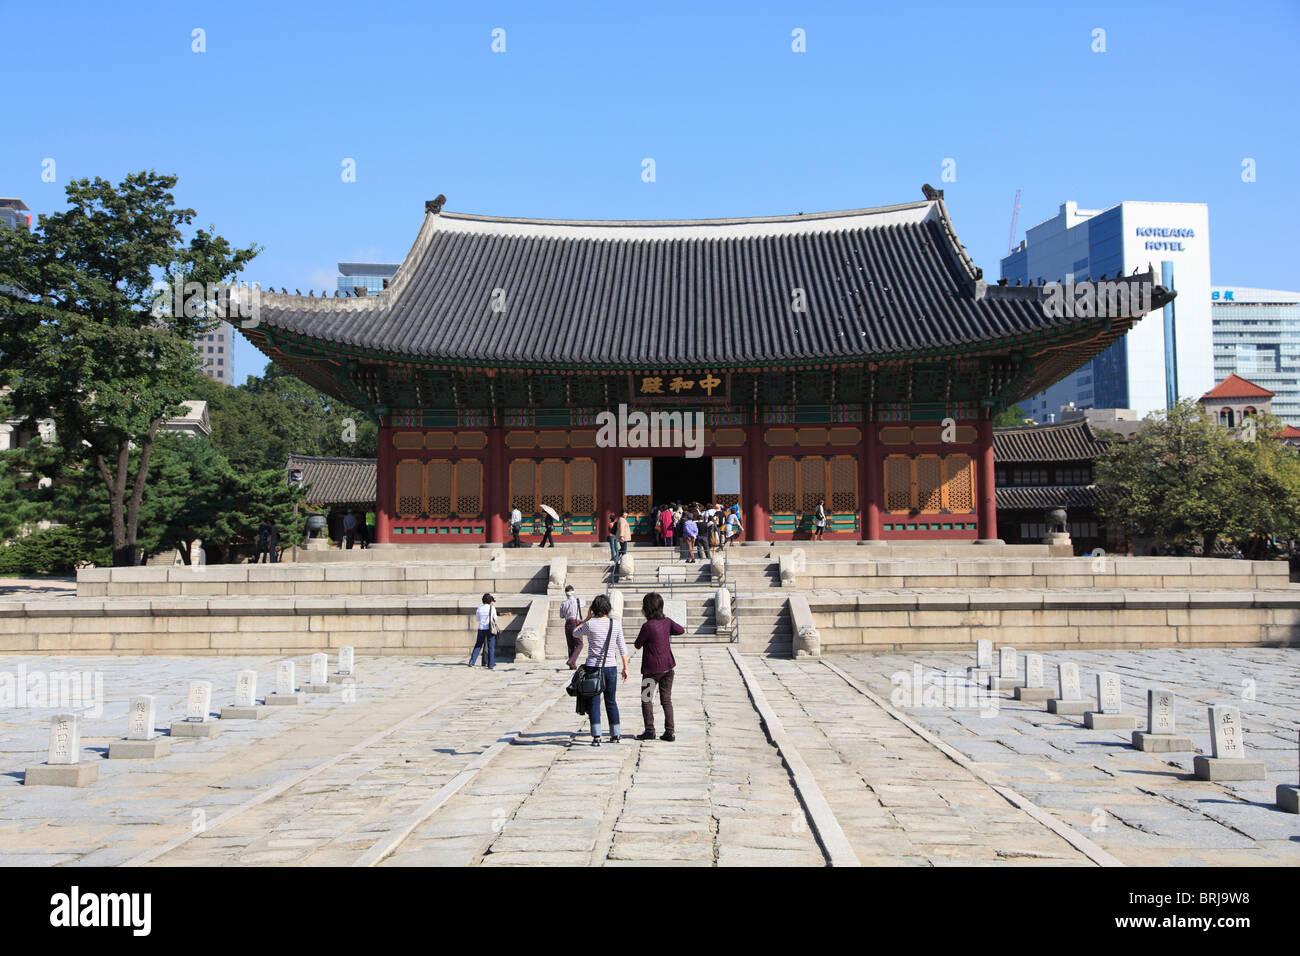 Deoksugung Palace, Palace of Virtuous Longevity, Seoul, South Korea, Asia Stock Photo